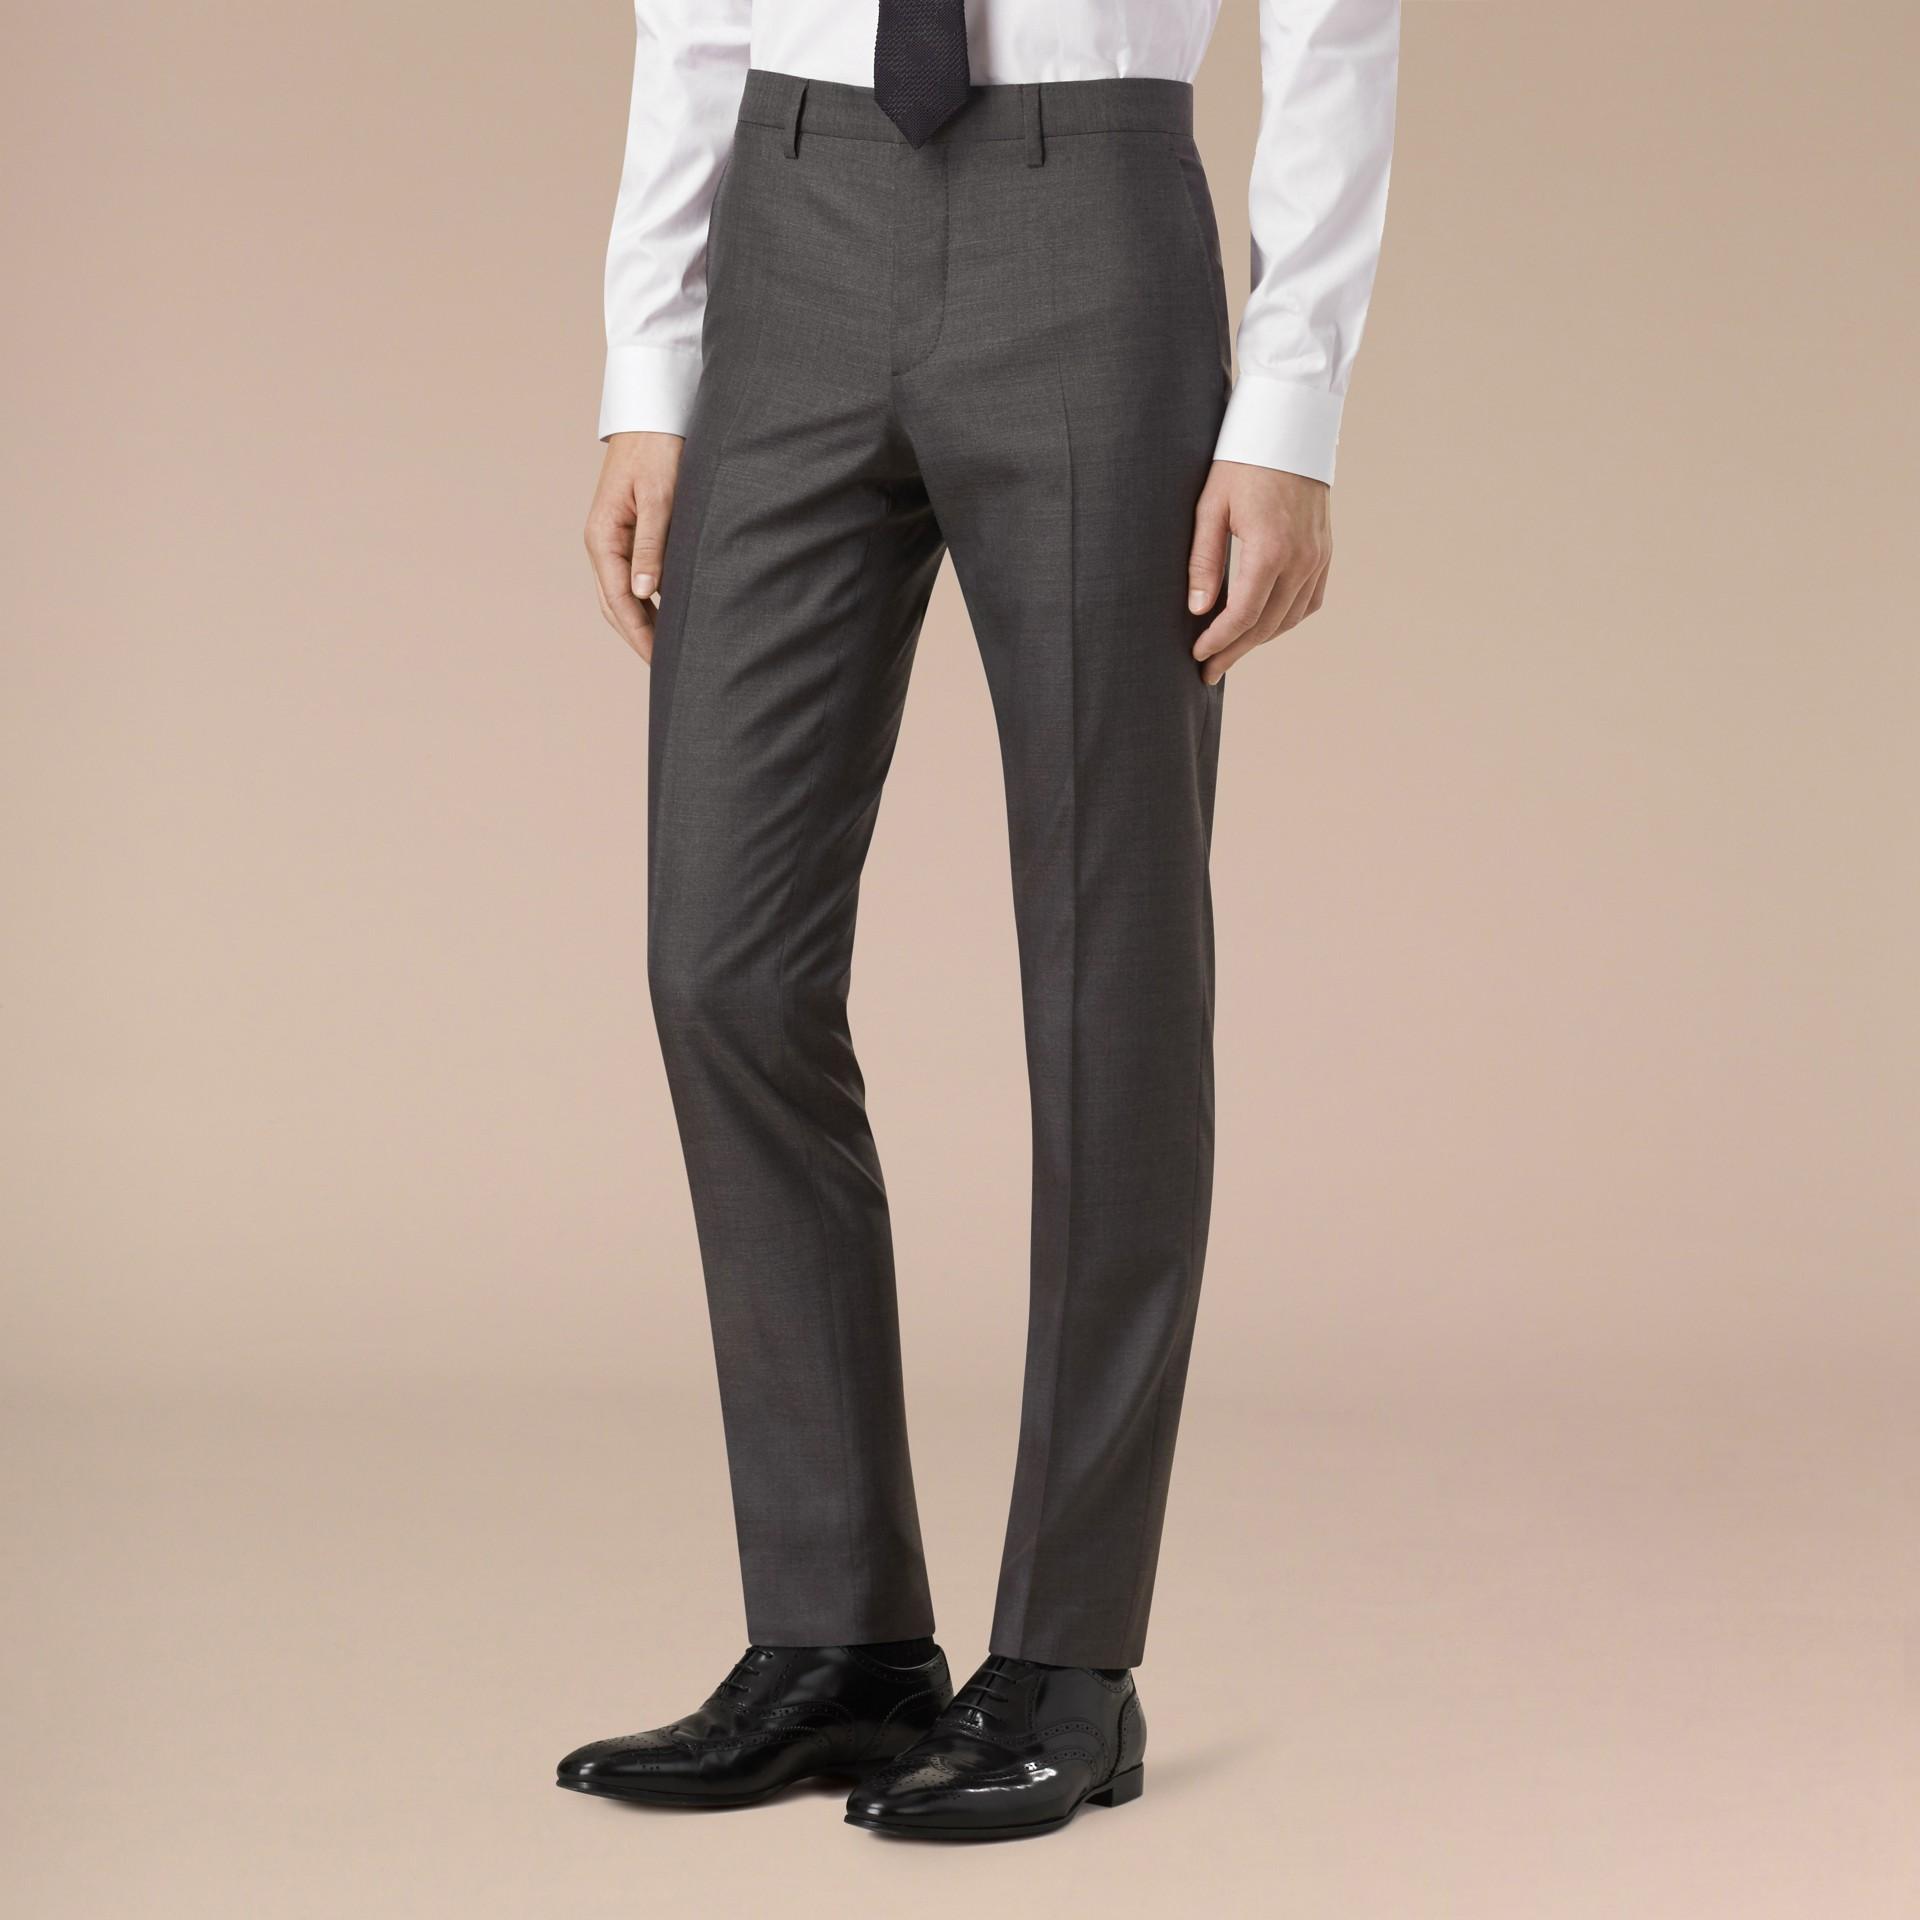 Темно-серый меланж Узкий костюм из шерсти и шелка - изображение 5